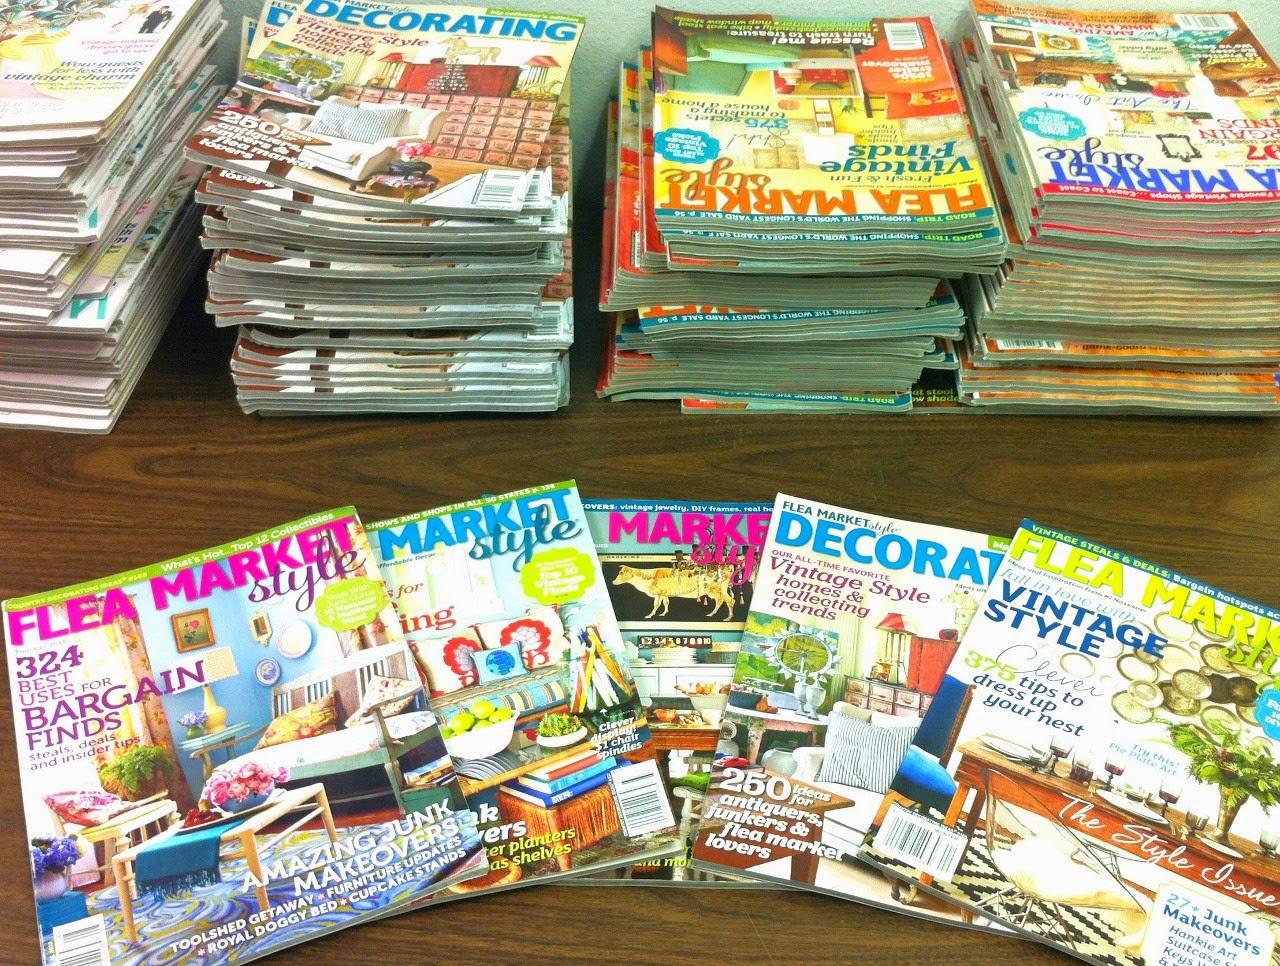 http://www.robomargo.com/magazineordering.html